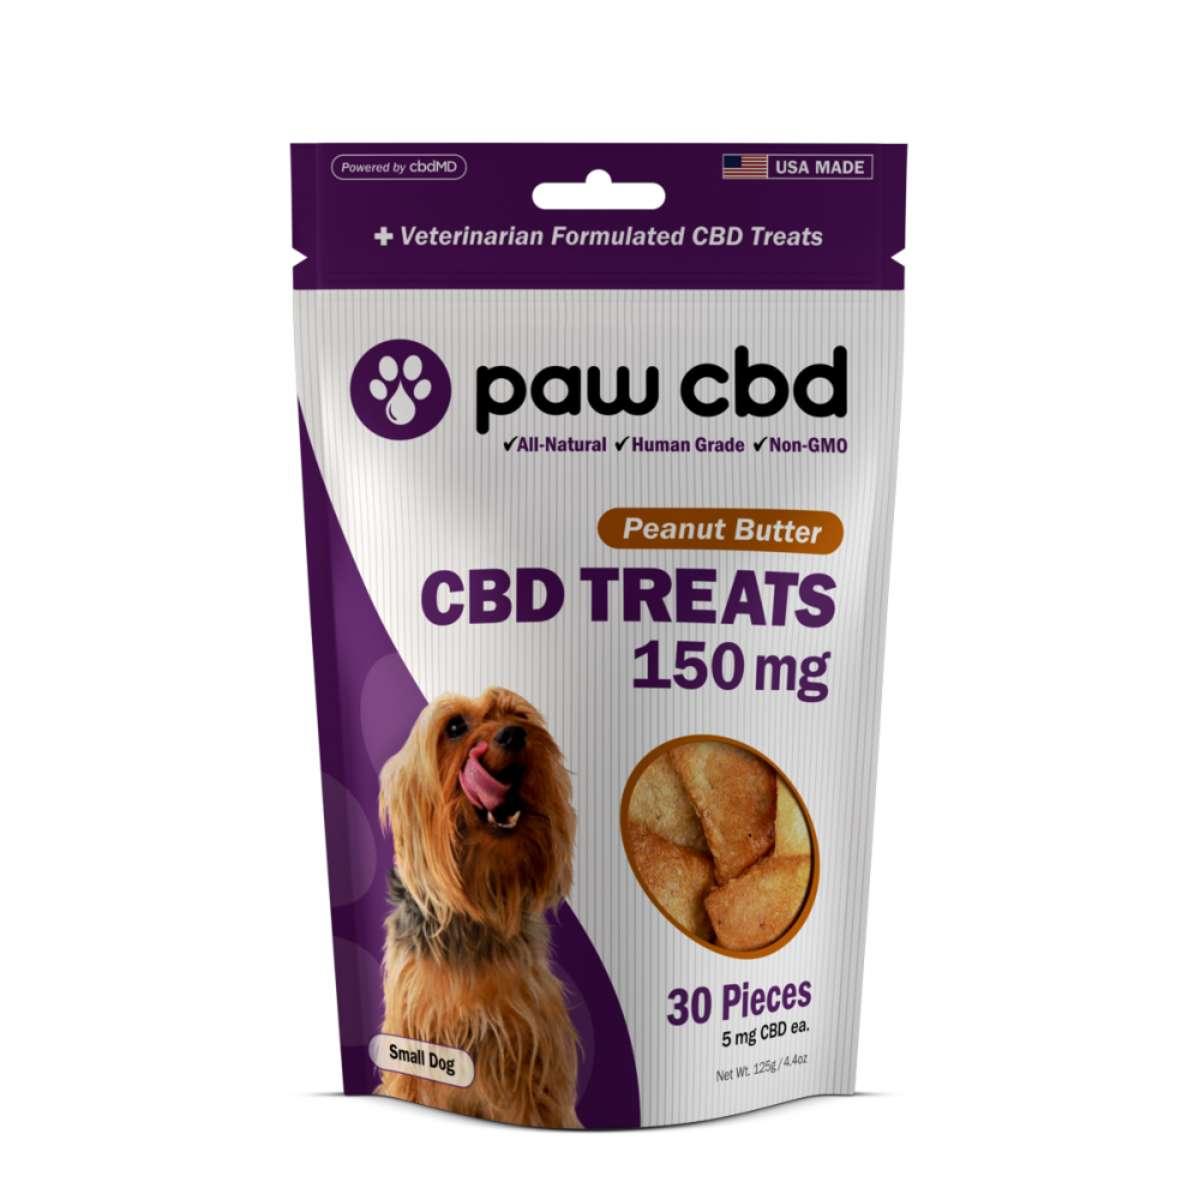 cbdMD Pet CBD Oil Treats for Dogs